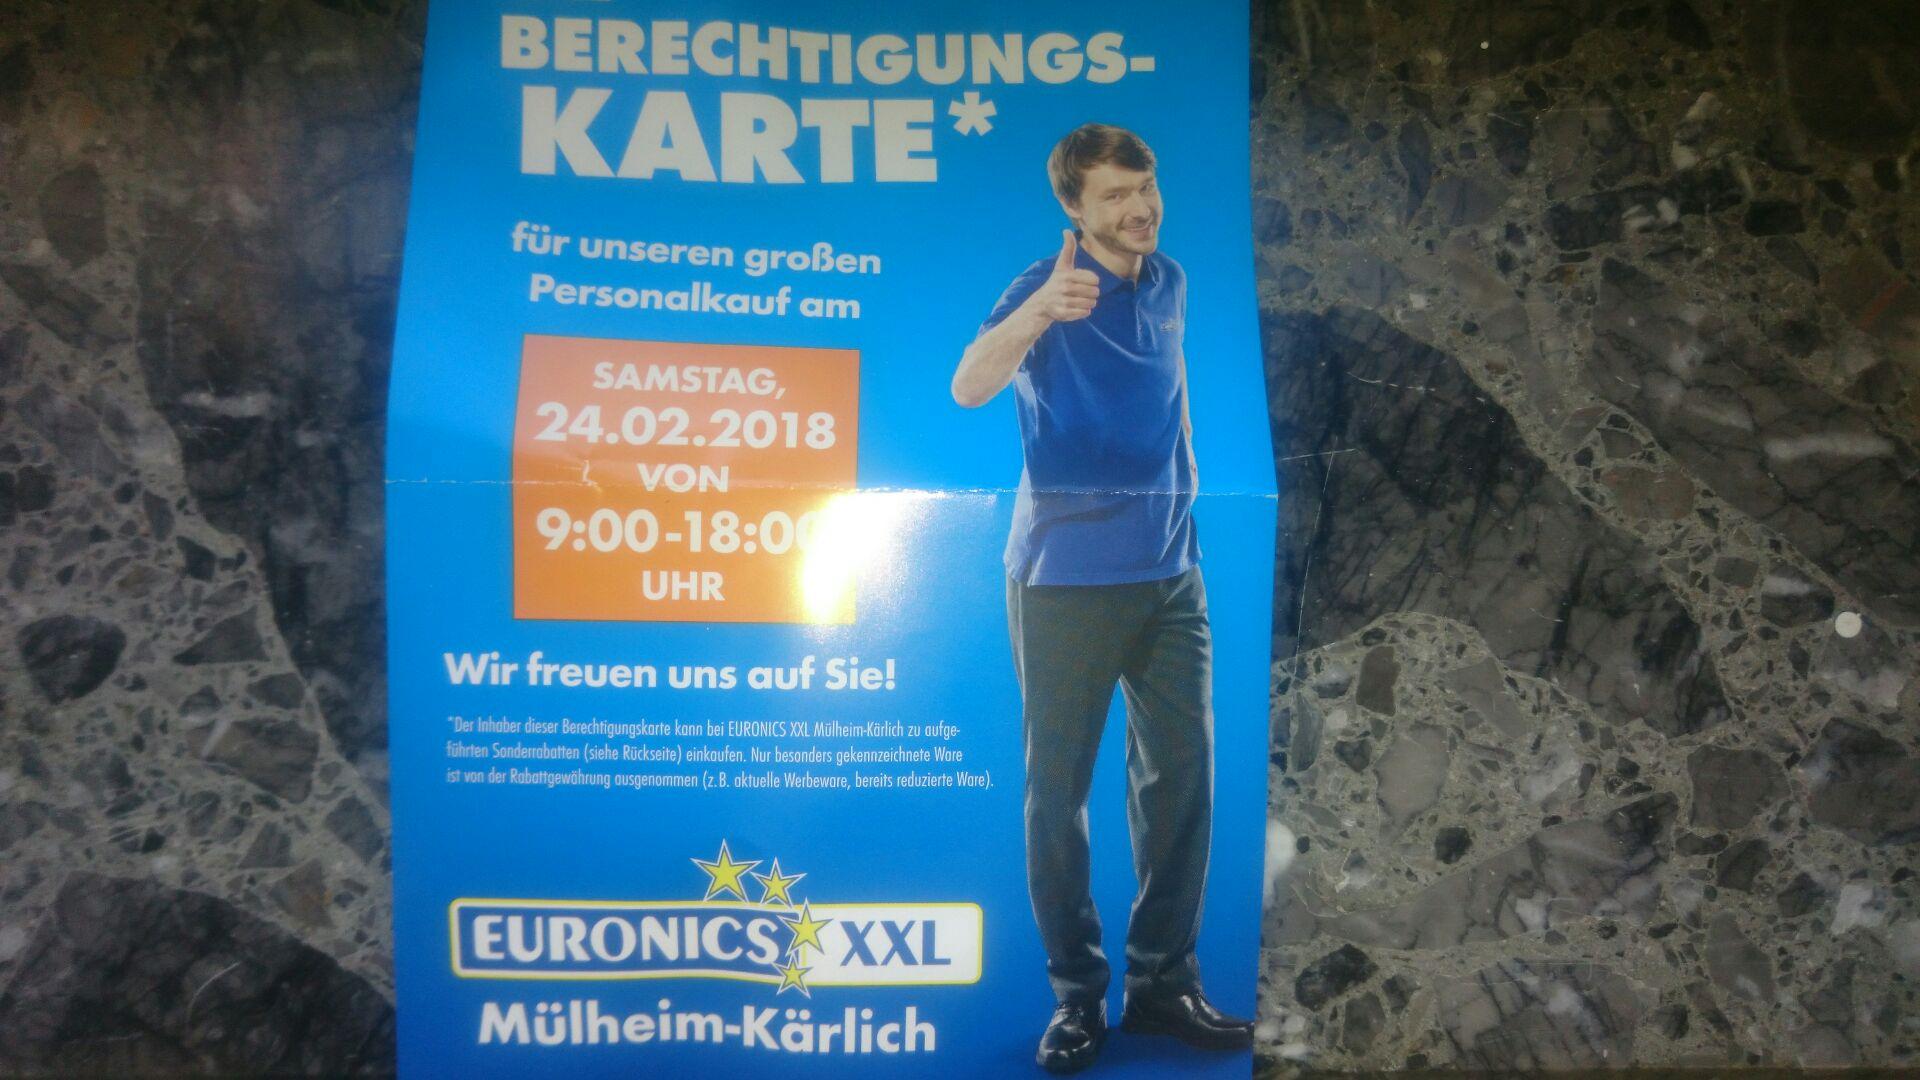 [Lokal] Euronics Mülheim Kärlich